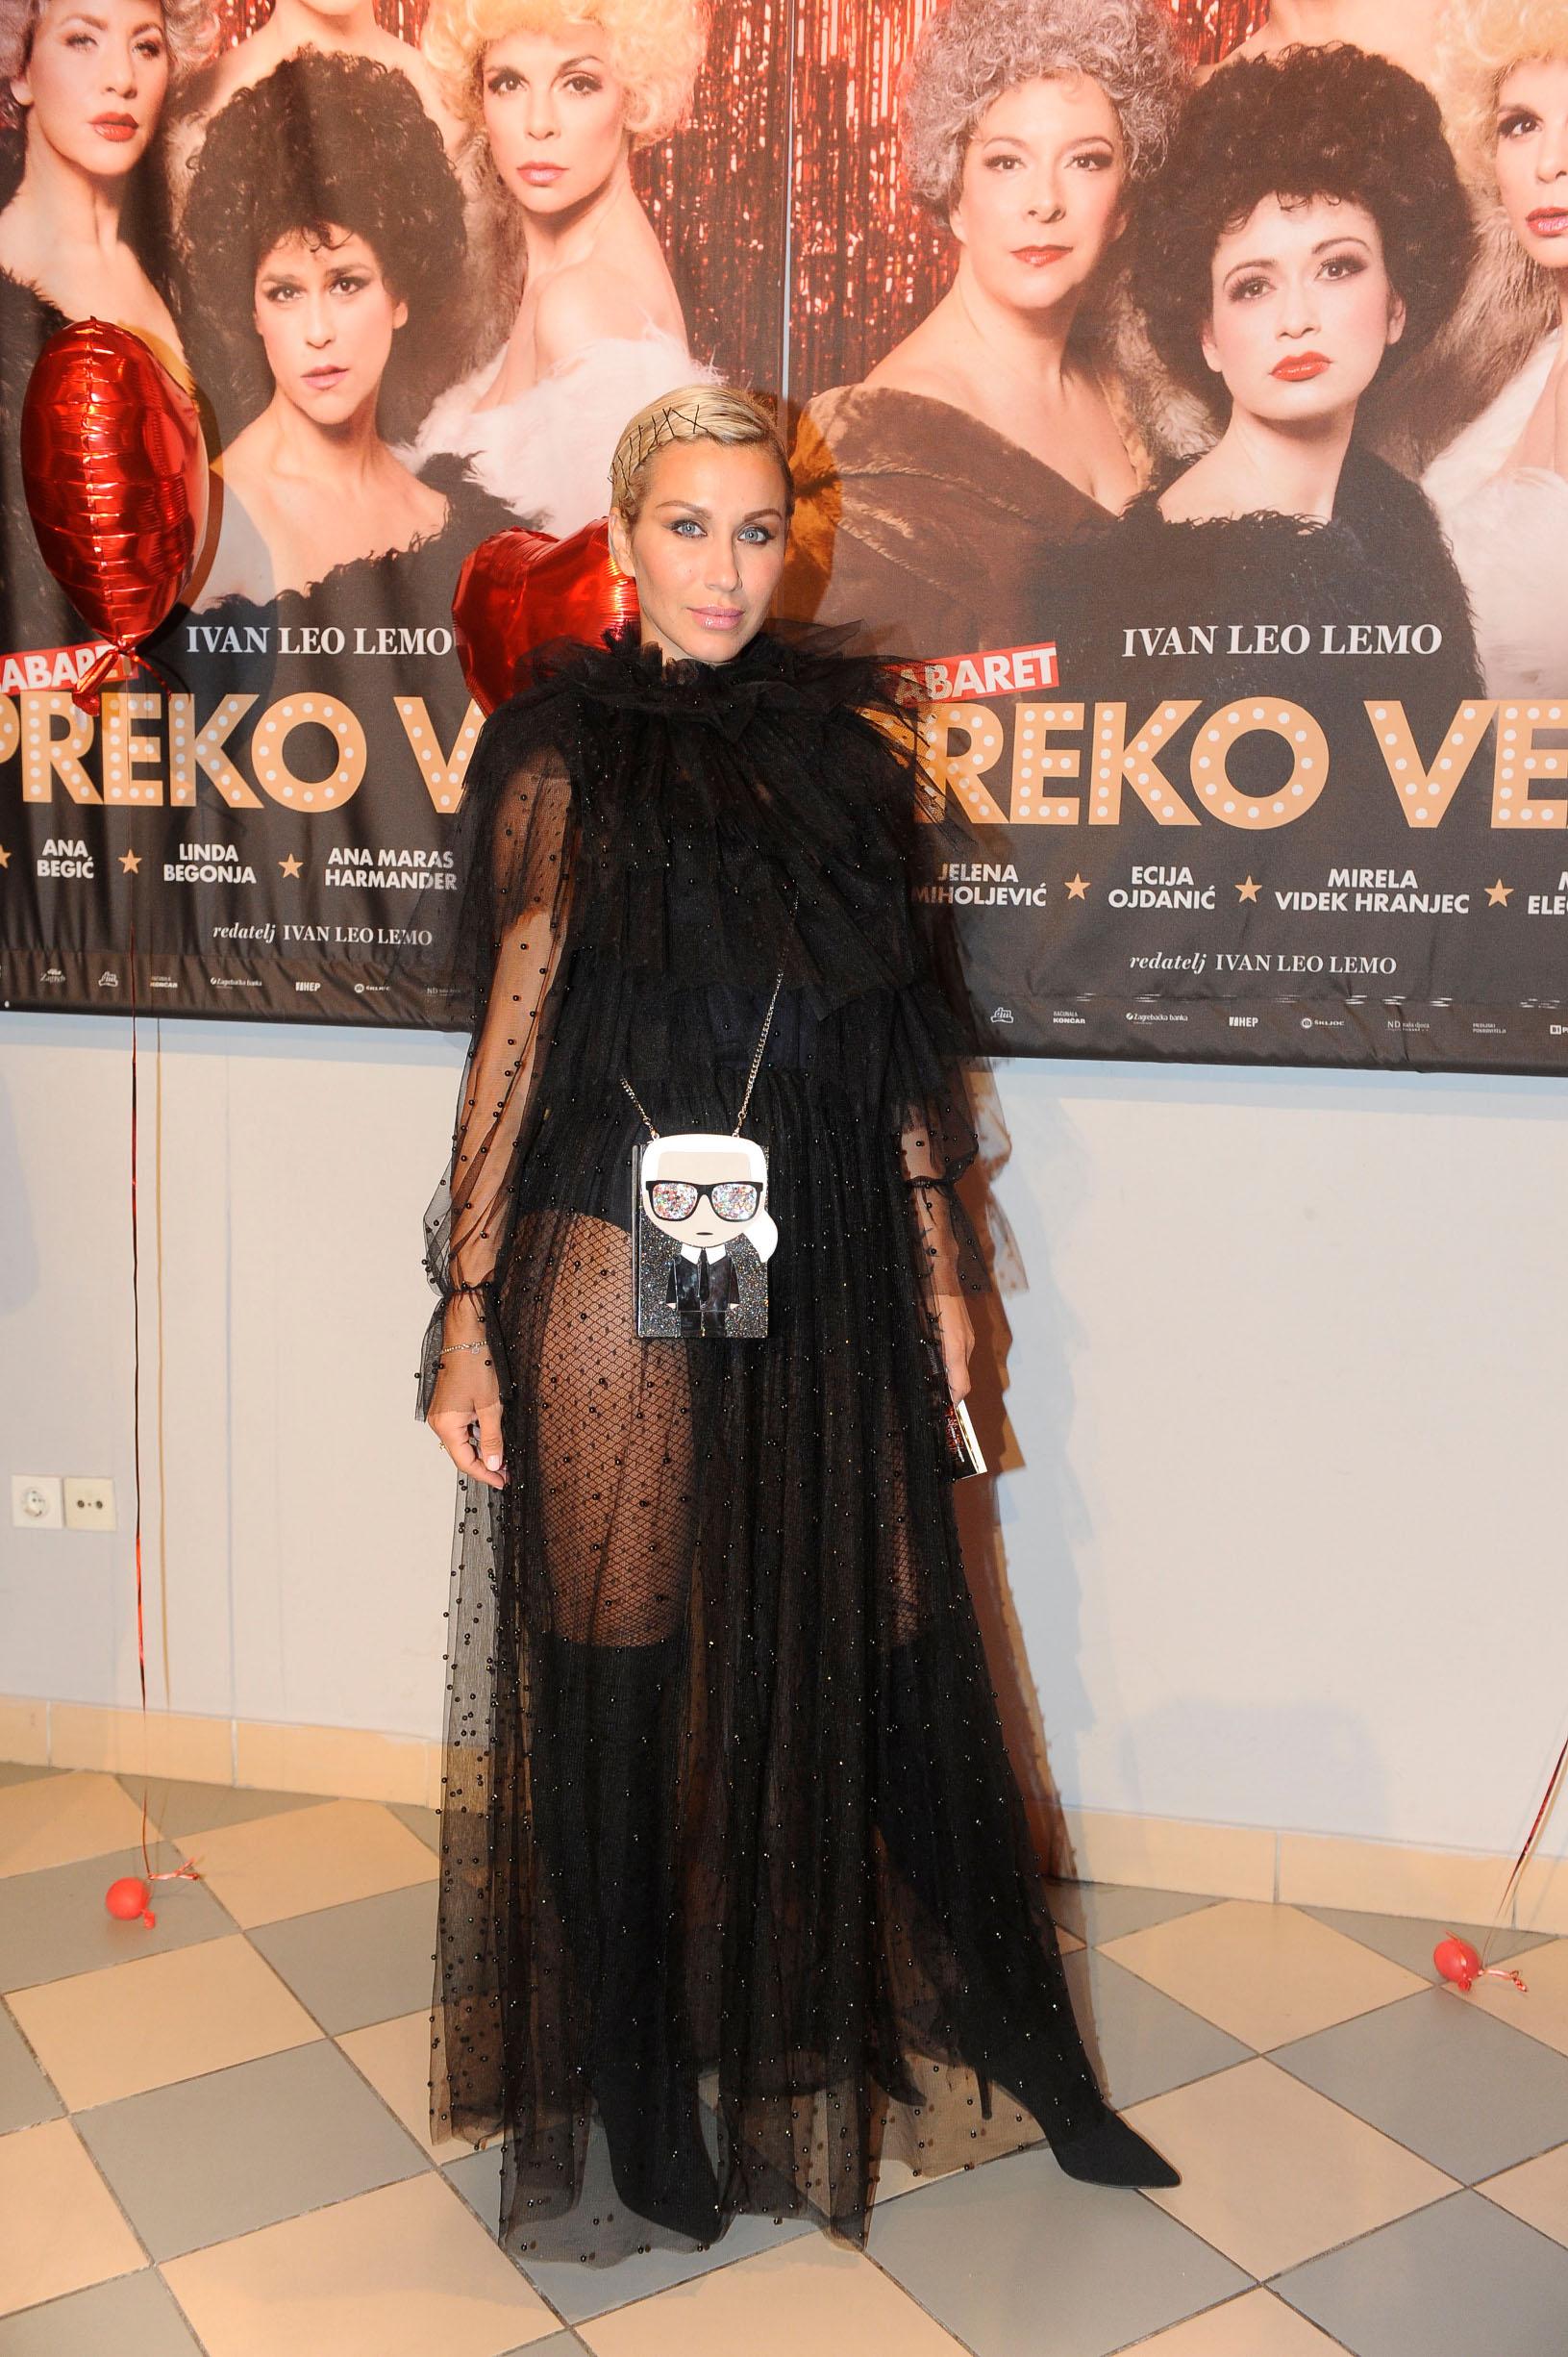 Ana Gruica Uglešić